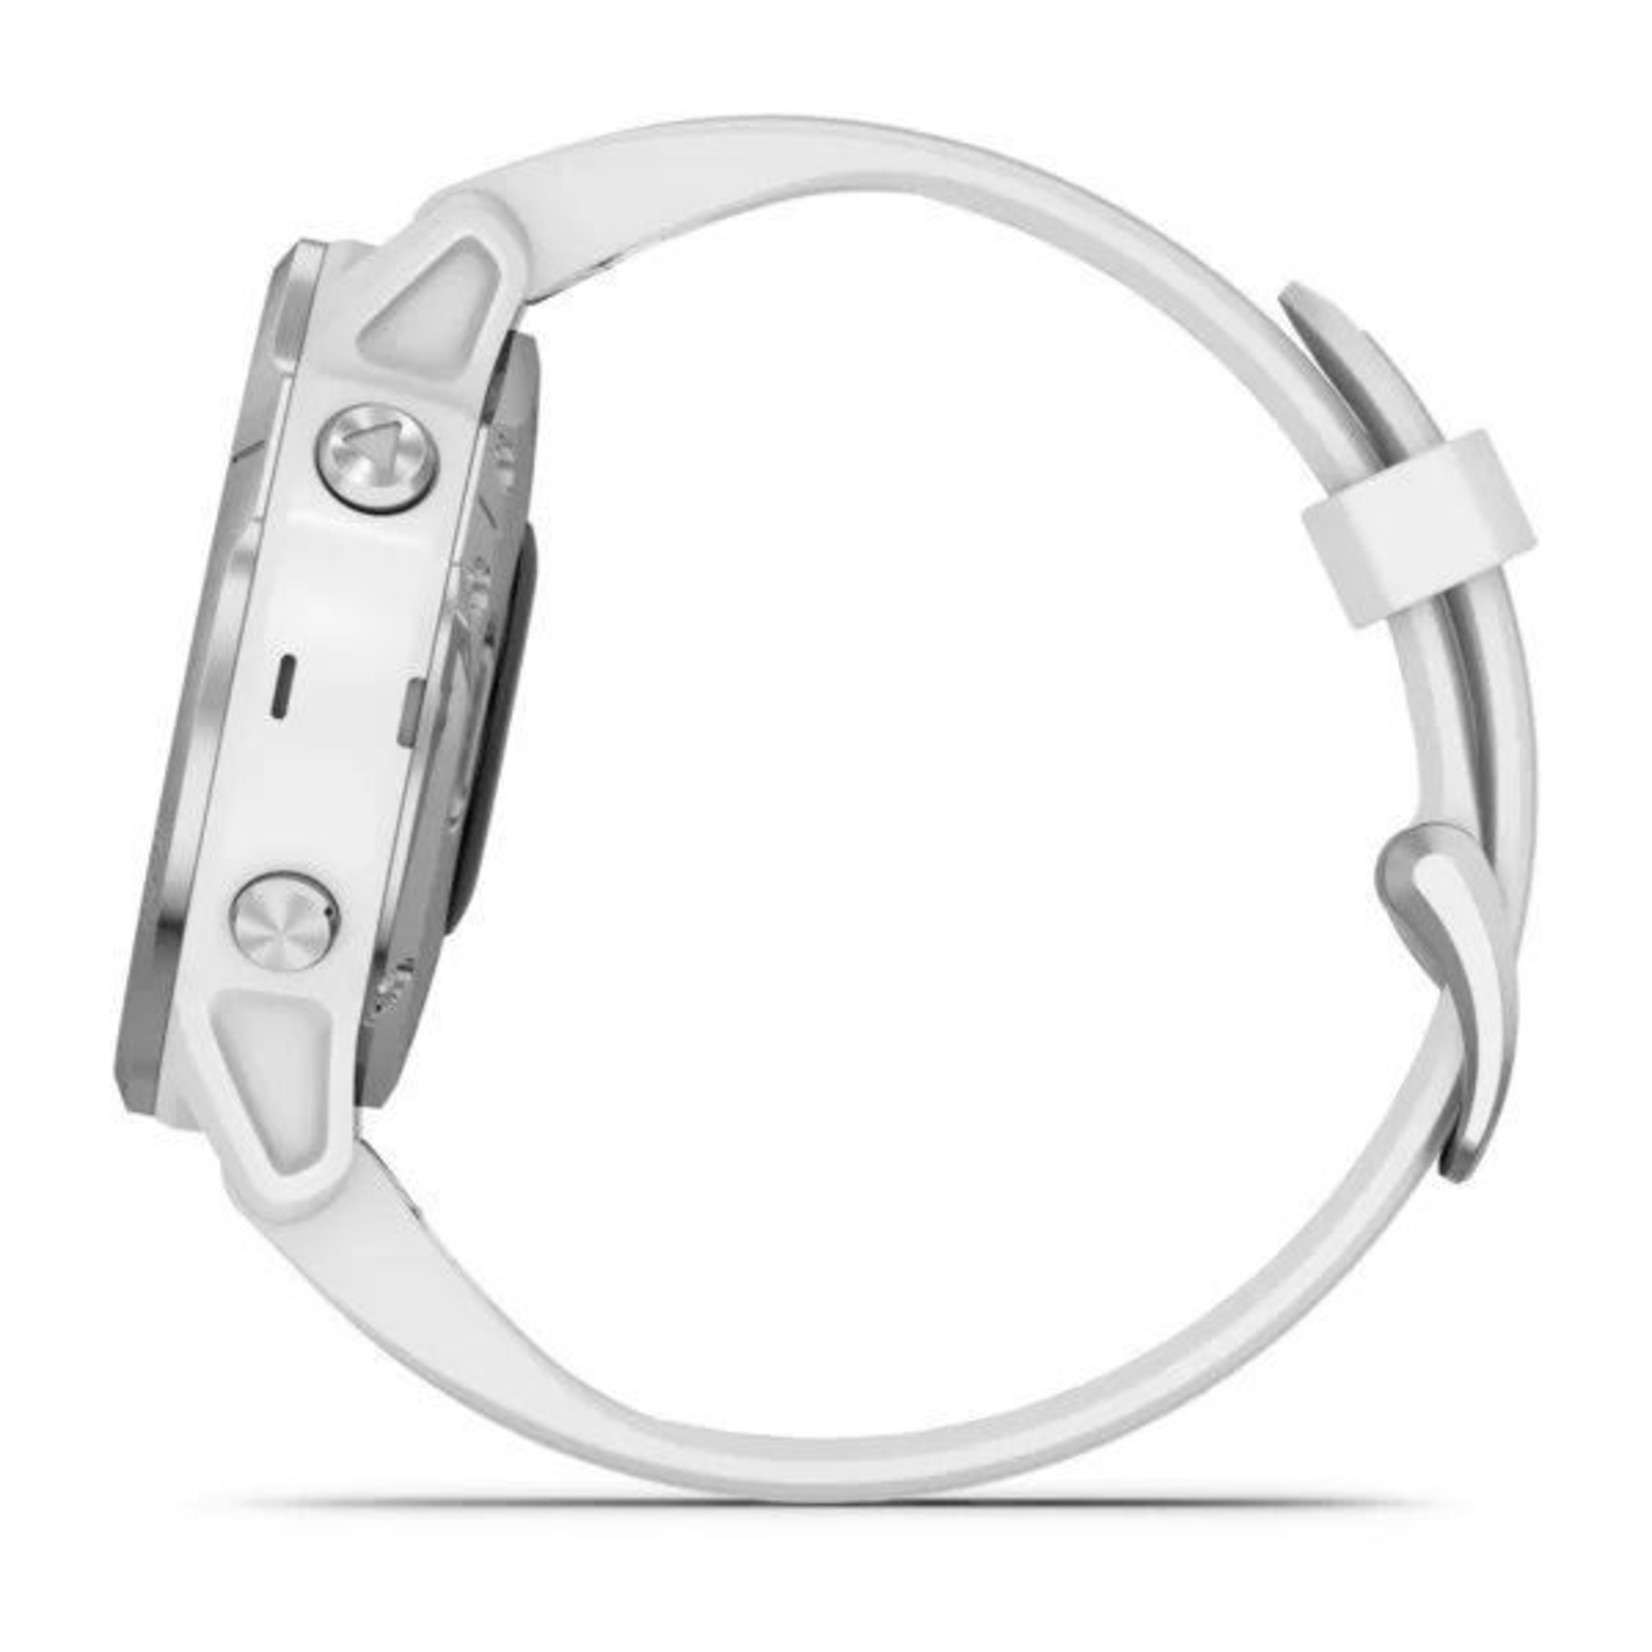 Garmin fēnix® 6S Silver with White Band